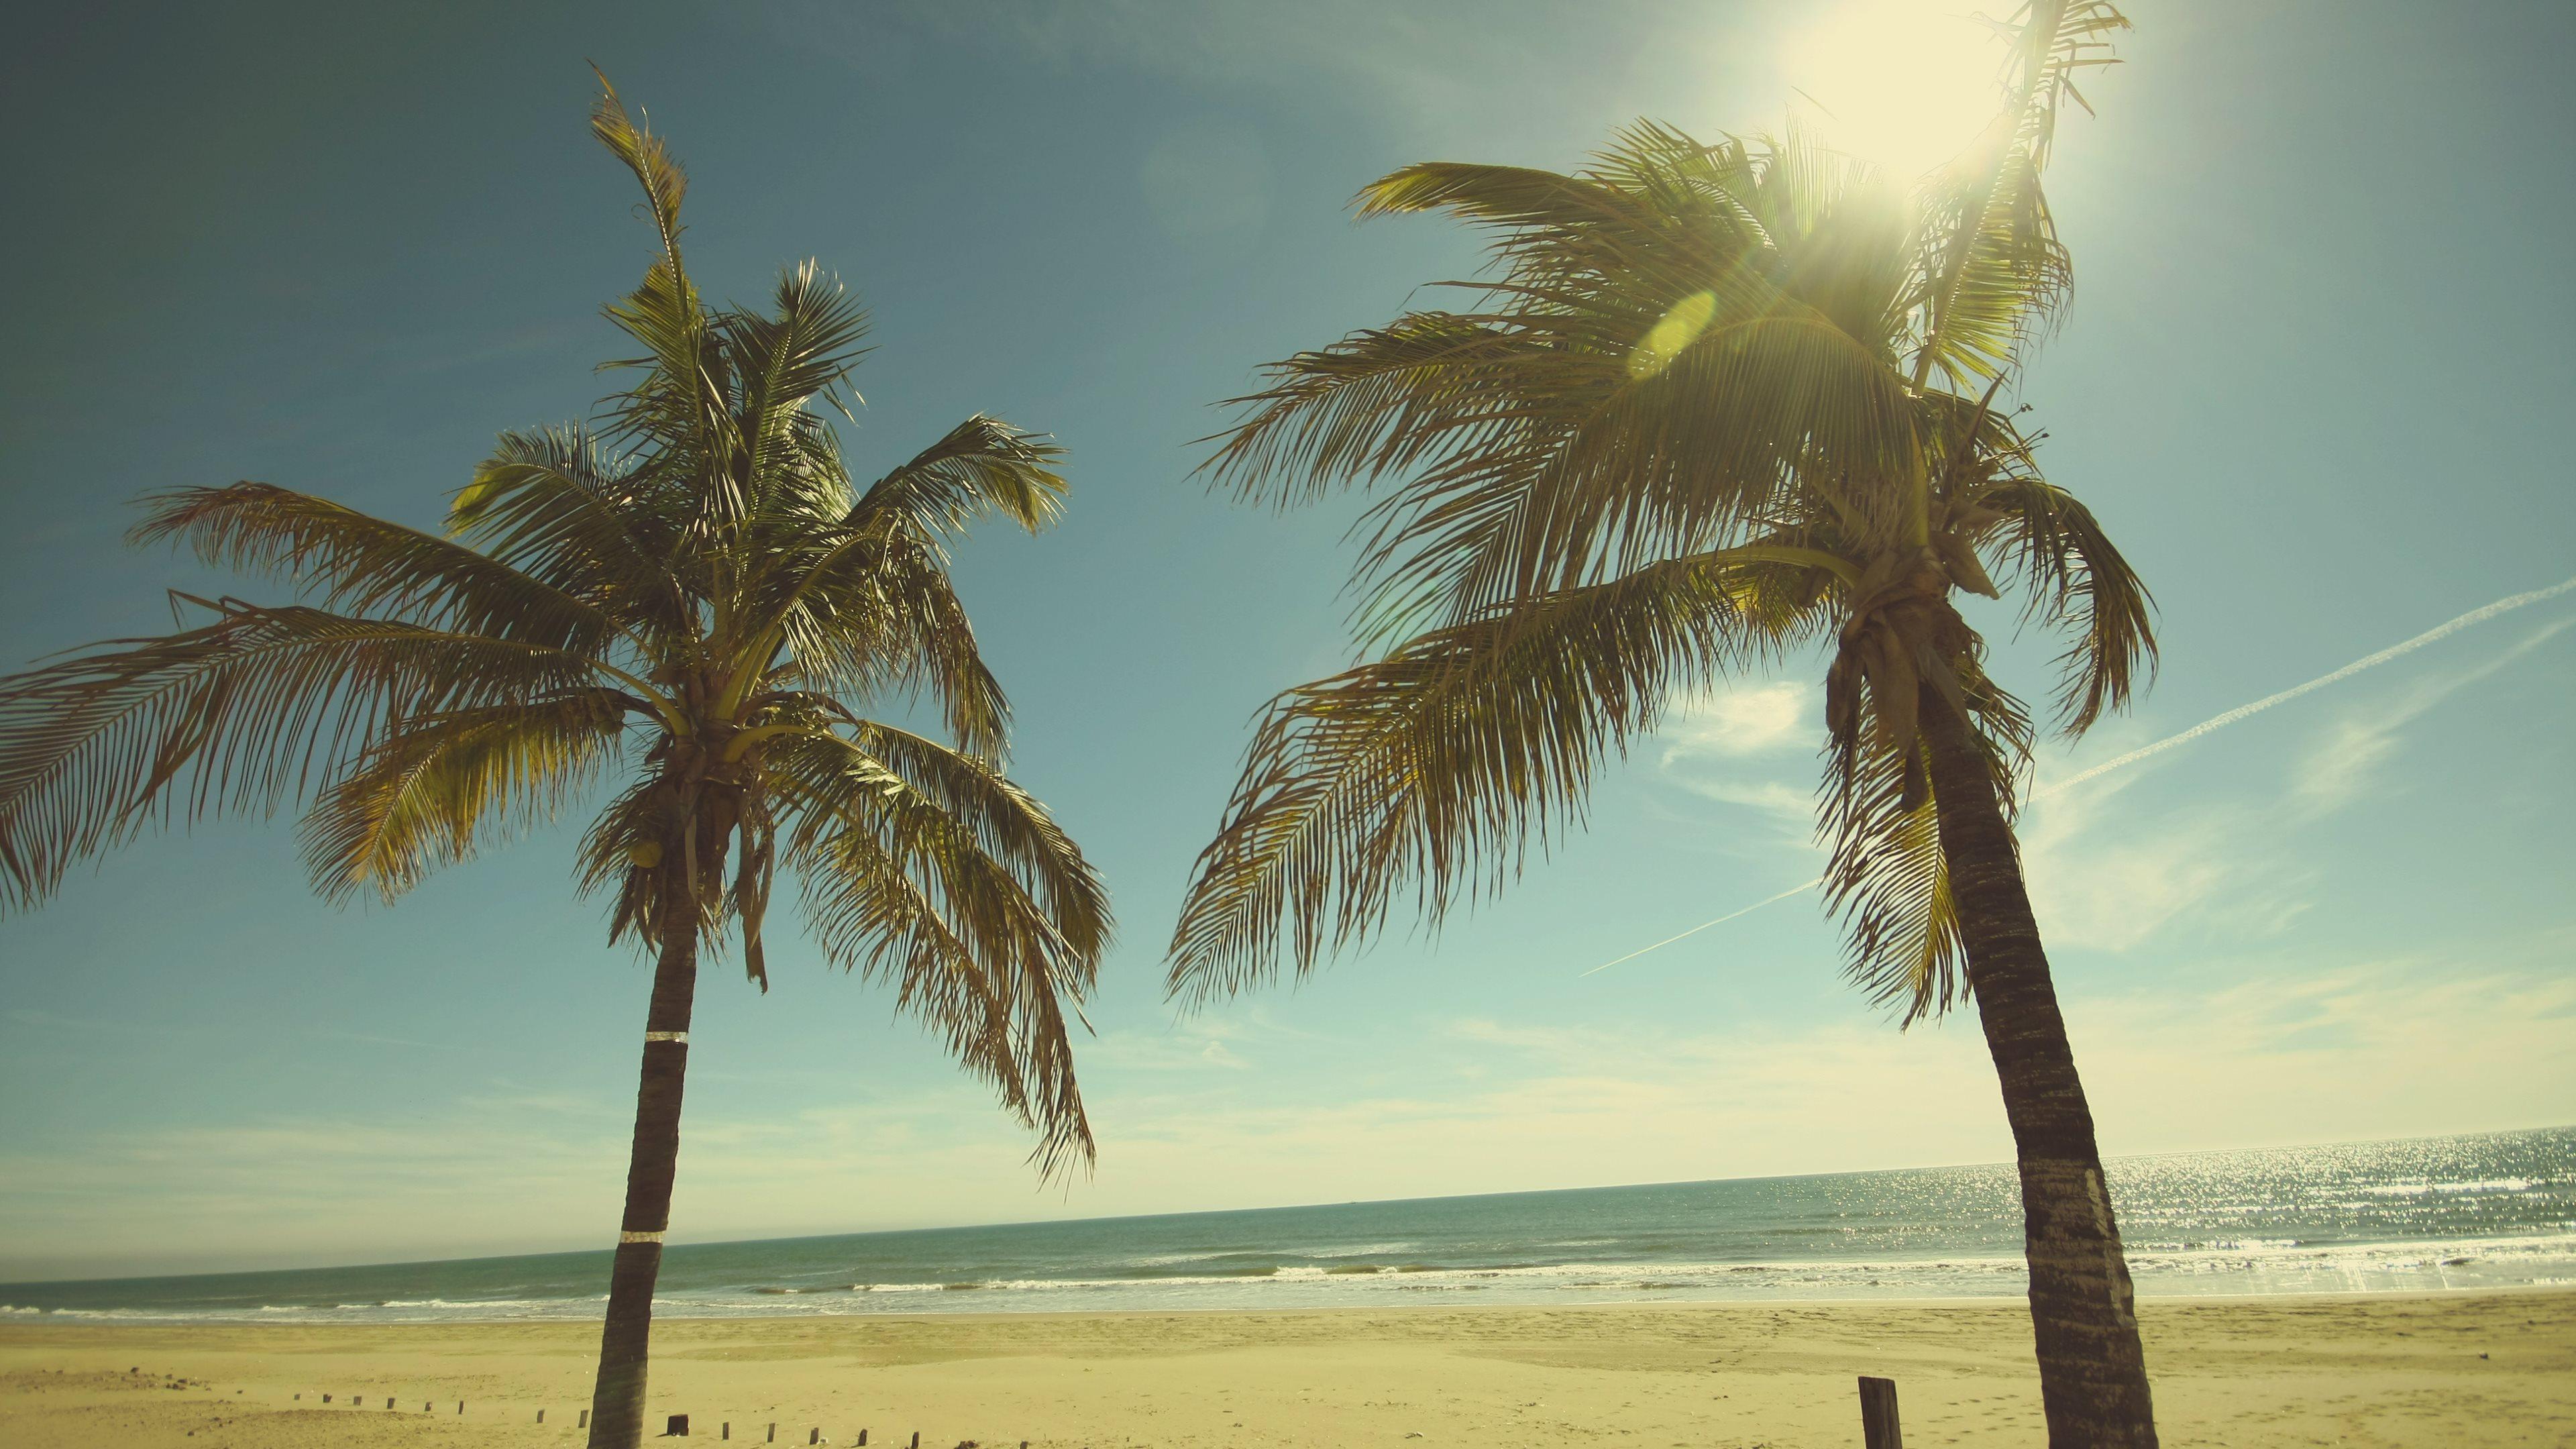 Amazing Wallpaper Macbook Palm Tree - 4K-Palm-Trees-Wallpaper-Full-HD1  Photograph_32072.jpg